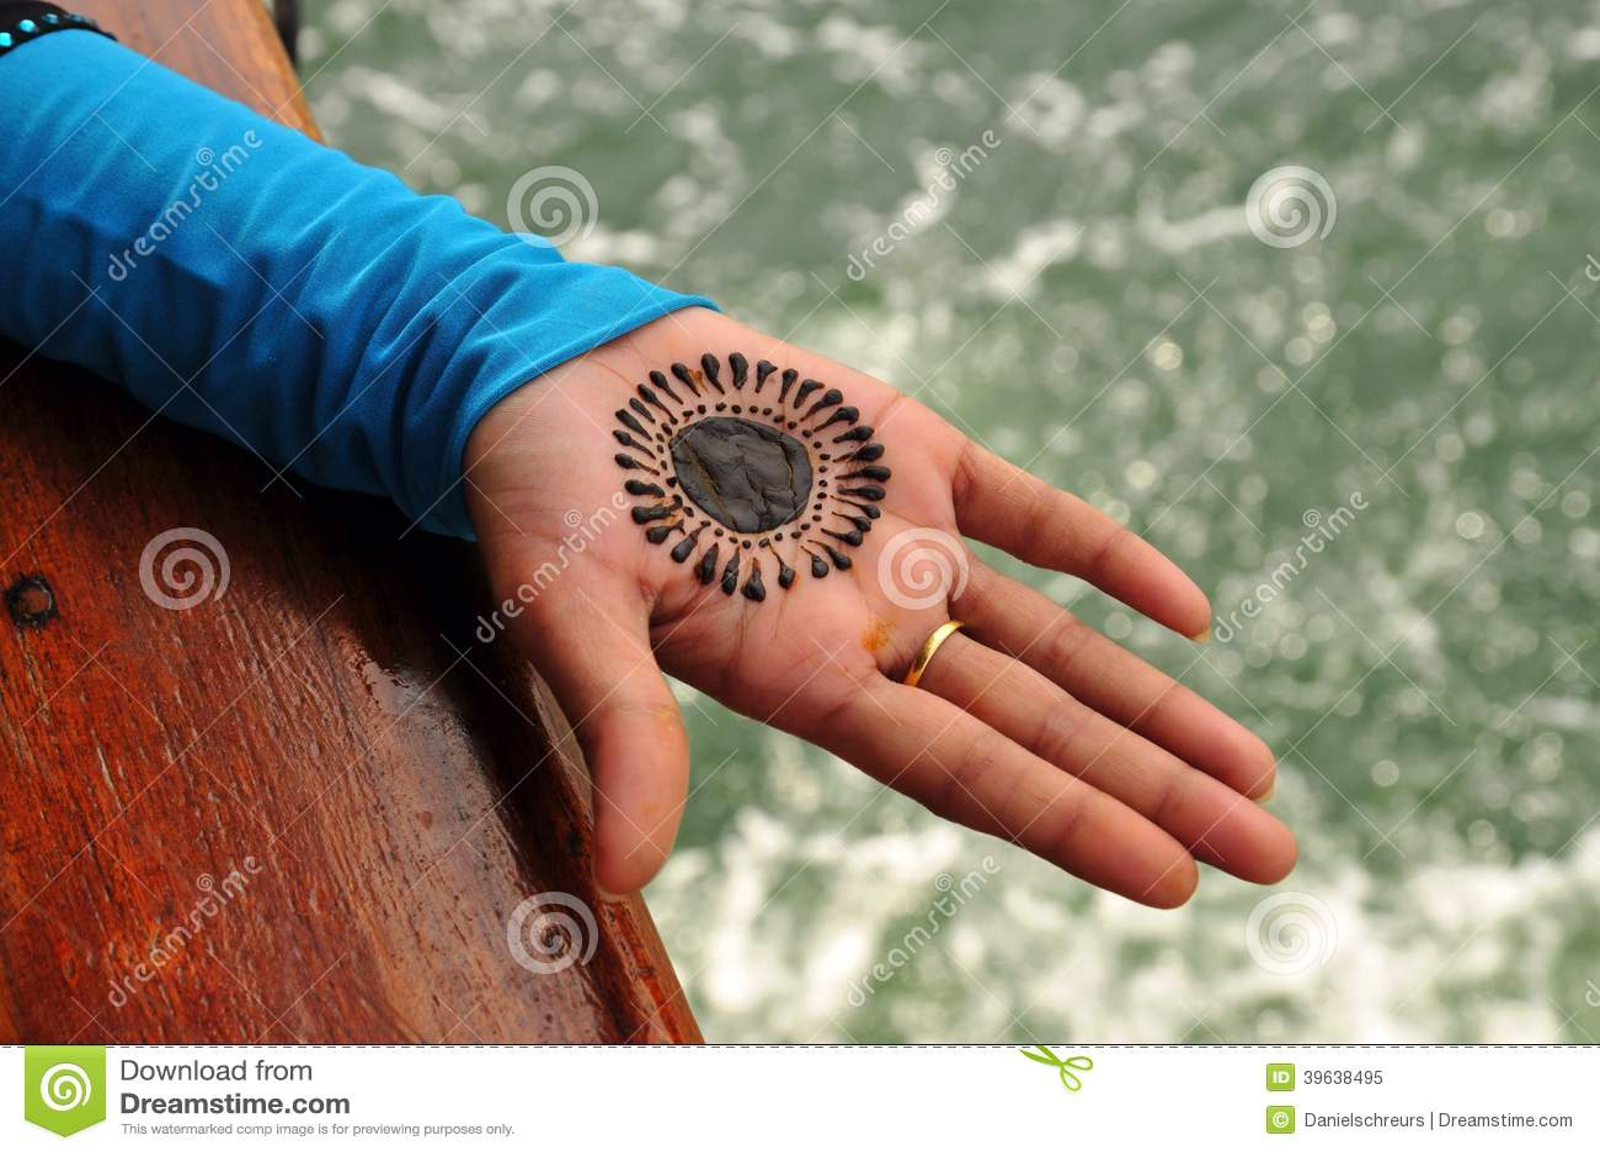 paume de henna tattoo en main image stock image du main normal 39638495. Black Bedroom Furniture Sets. Home Design Ideas